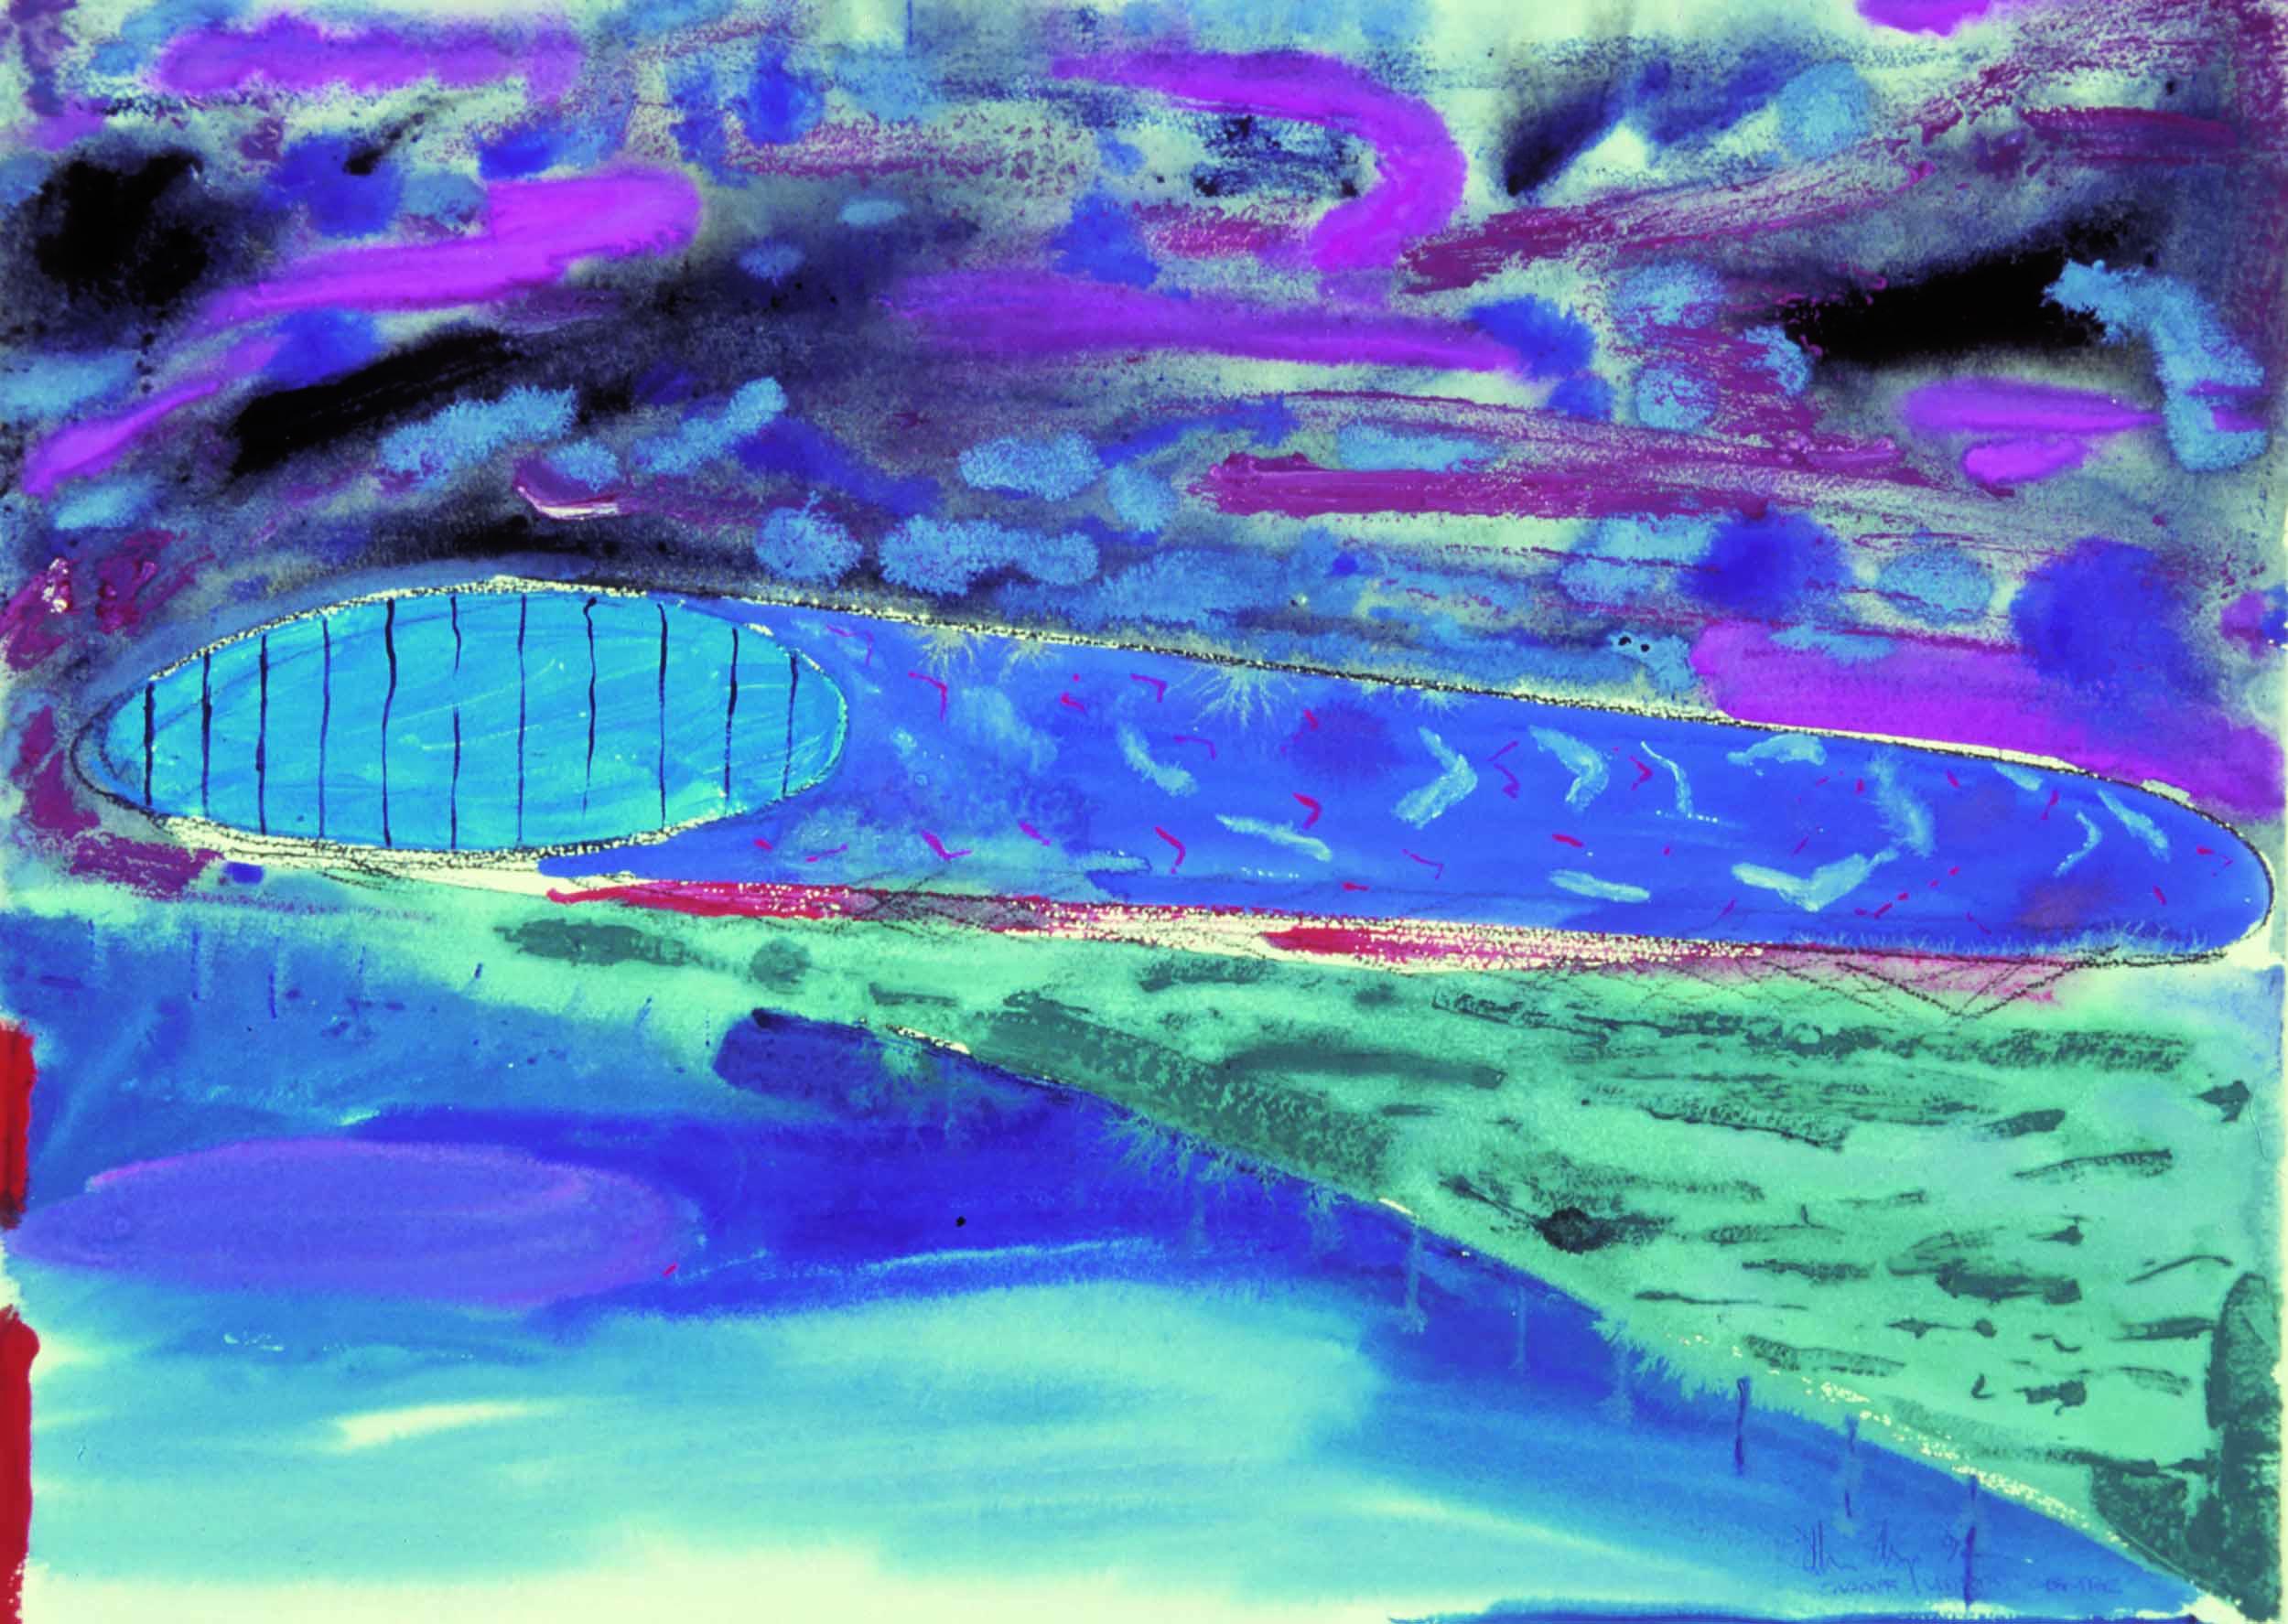 0241_0103 Cardiff_Bay_Visitors.jpg